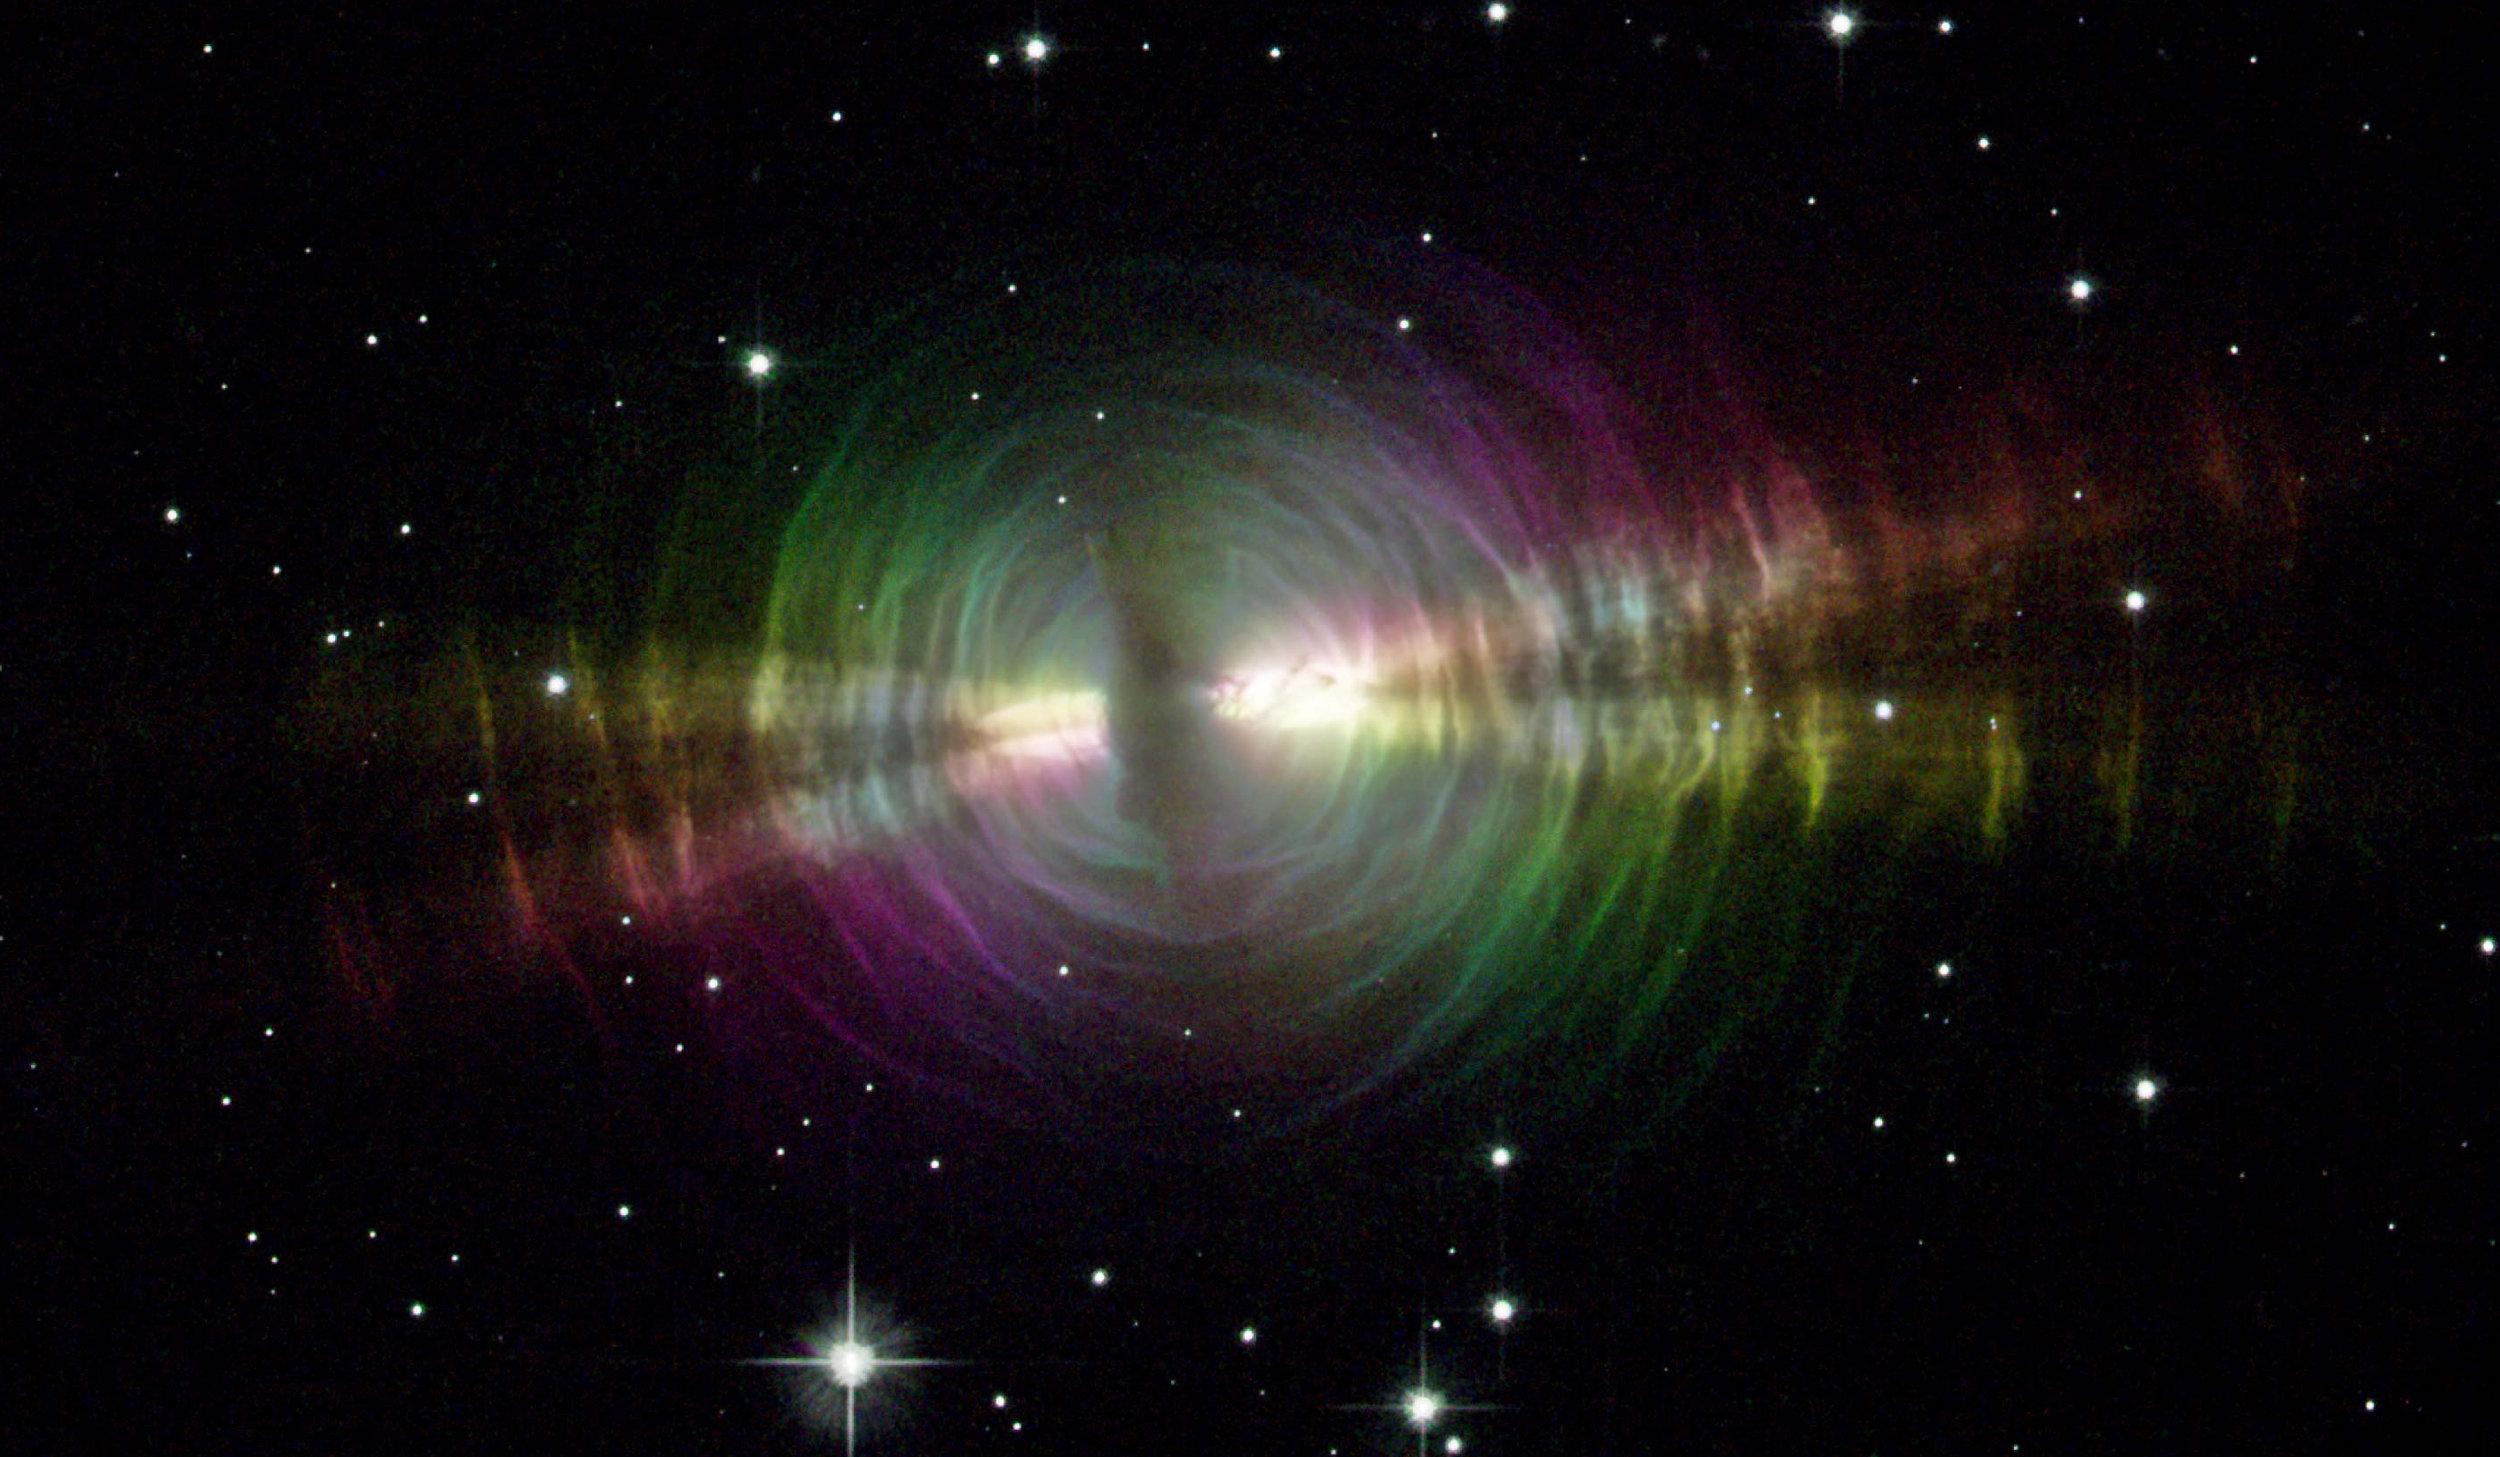 Egg Nebula! Image credit: Hubble/NASA/STScI/JPL